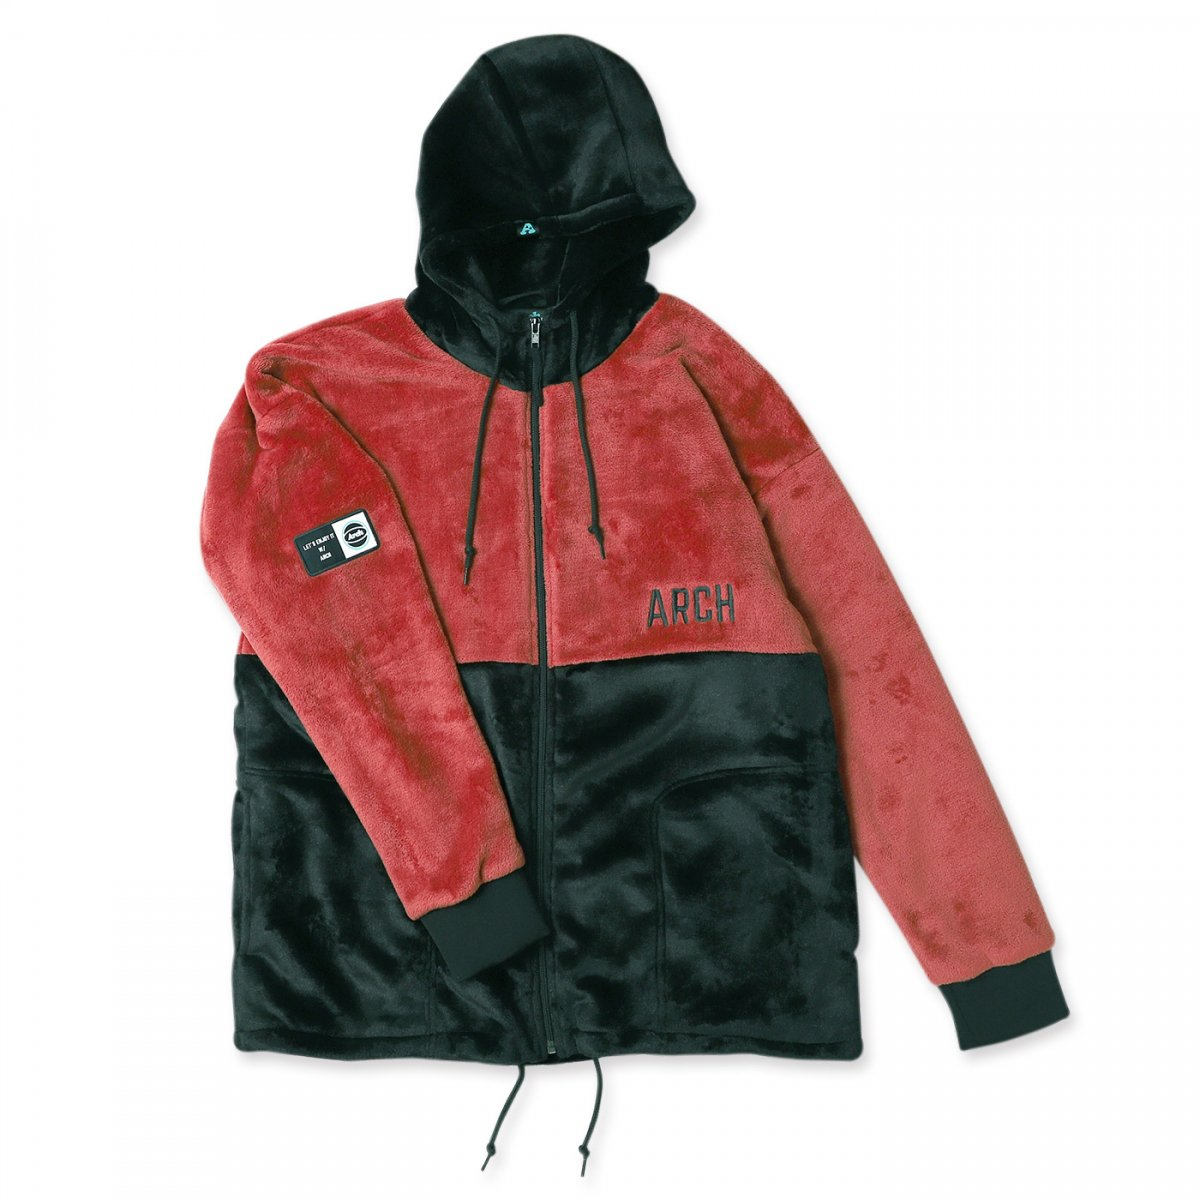 sport fleece jacket 【garnet/black】